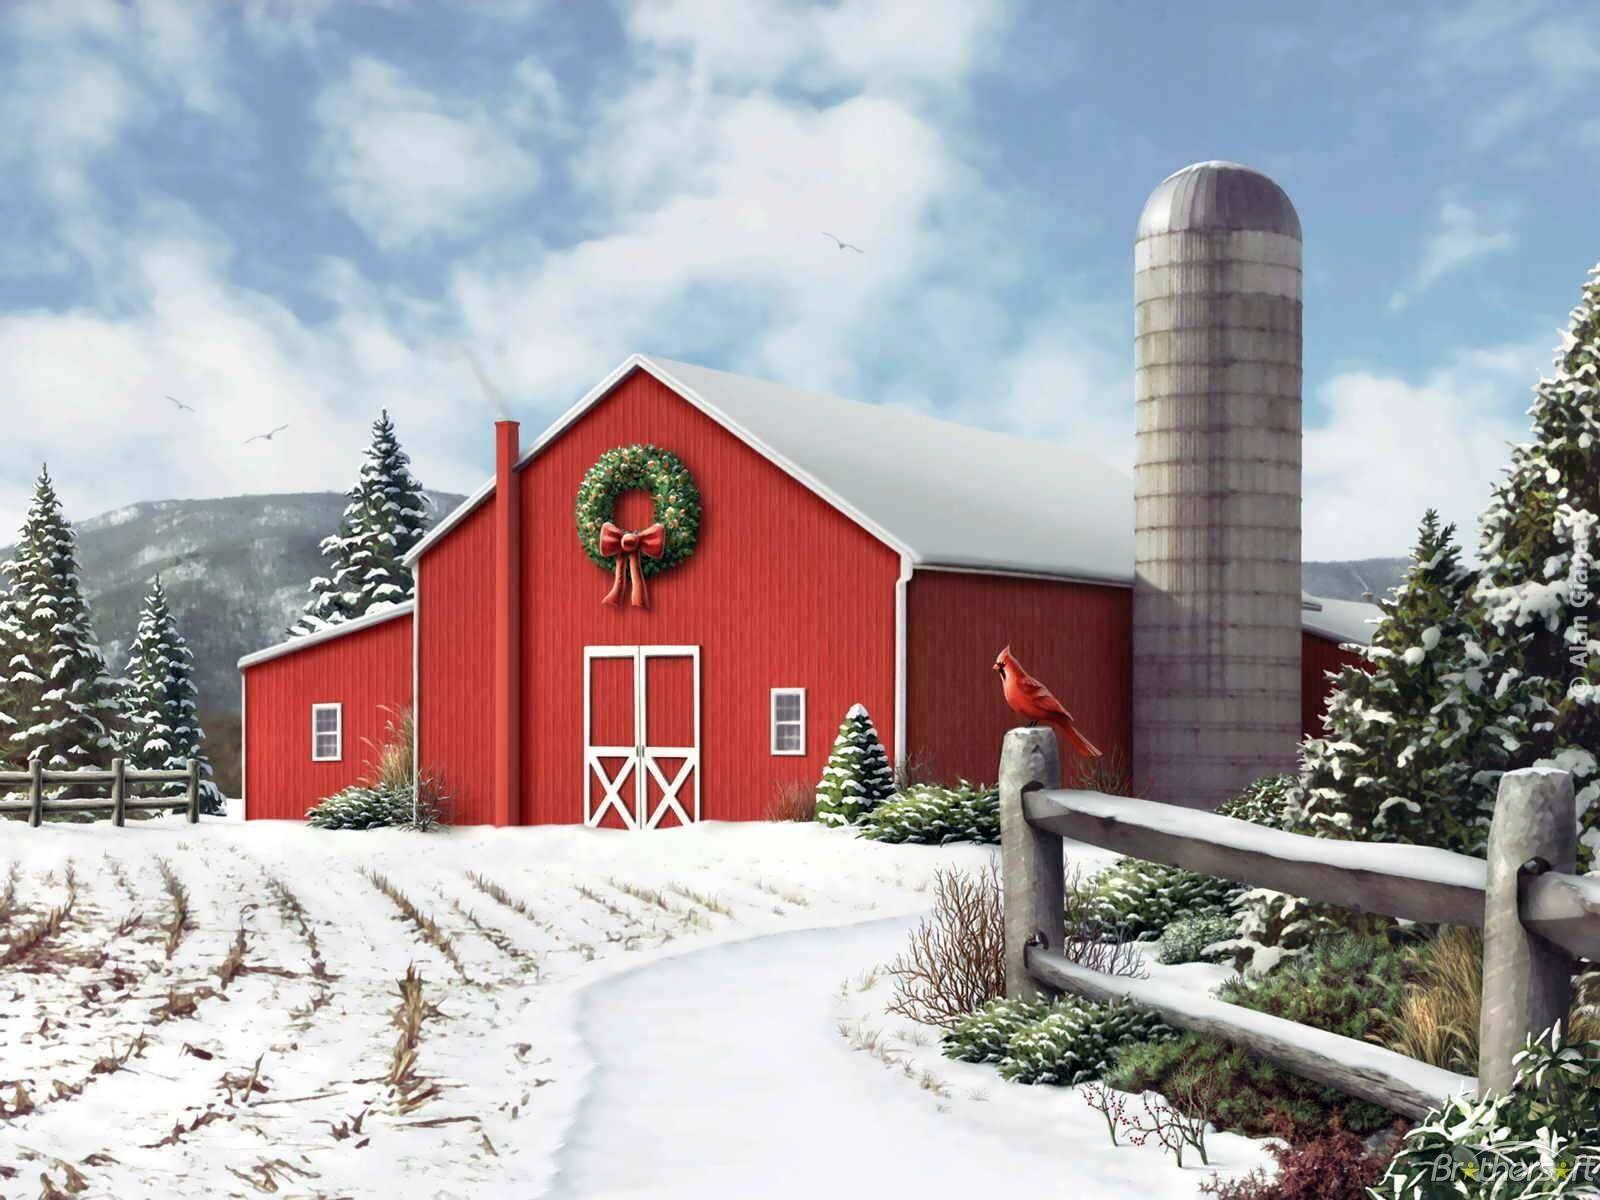 45 winter barn scenes wallpaper on wallpapersafari - Winter farm scenes wallpaper ...